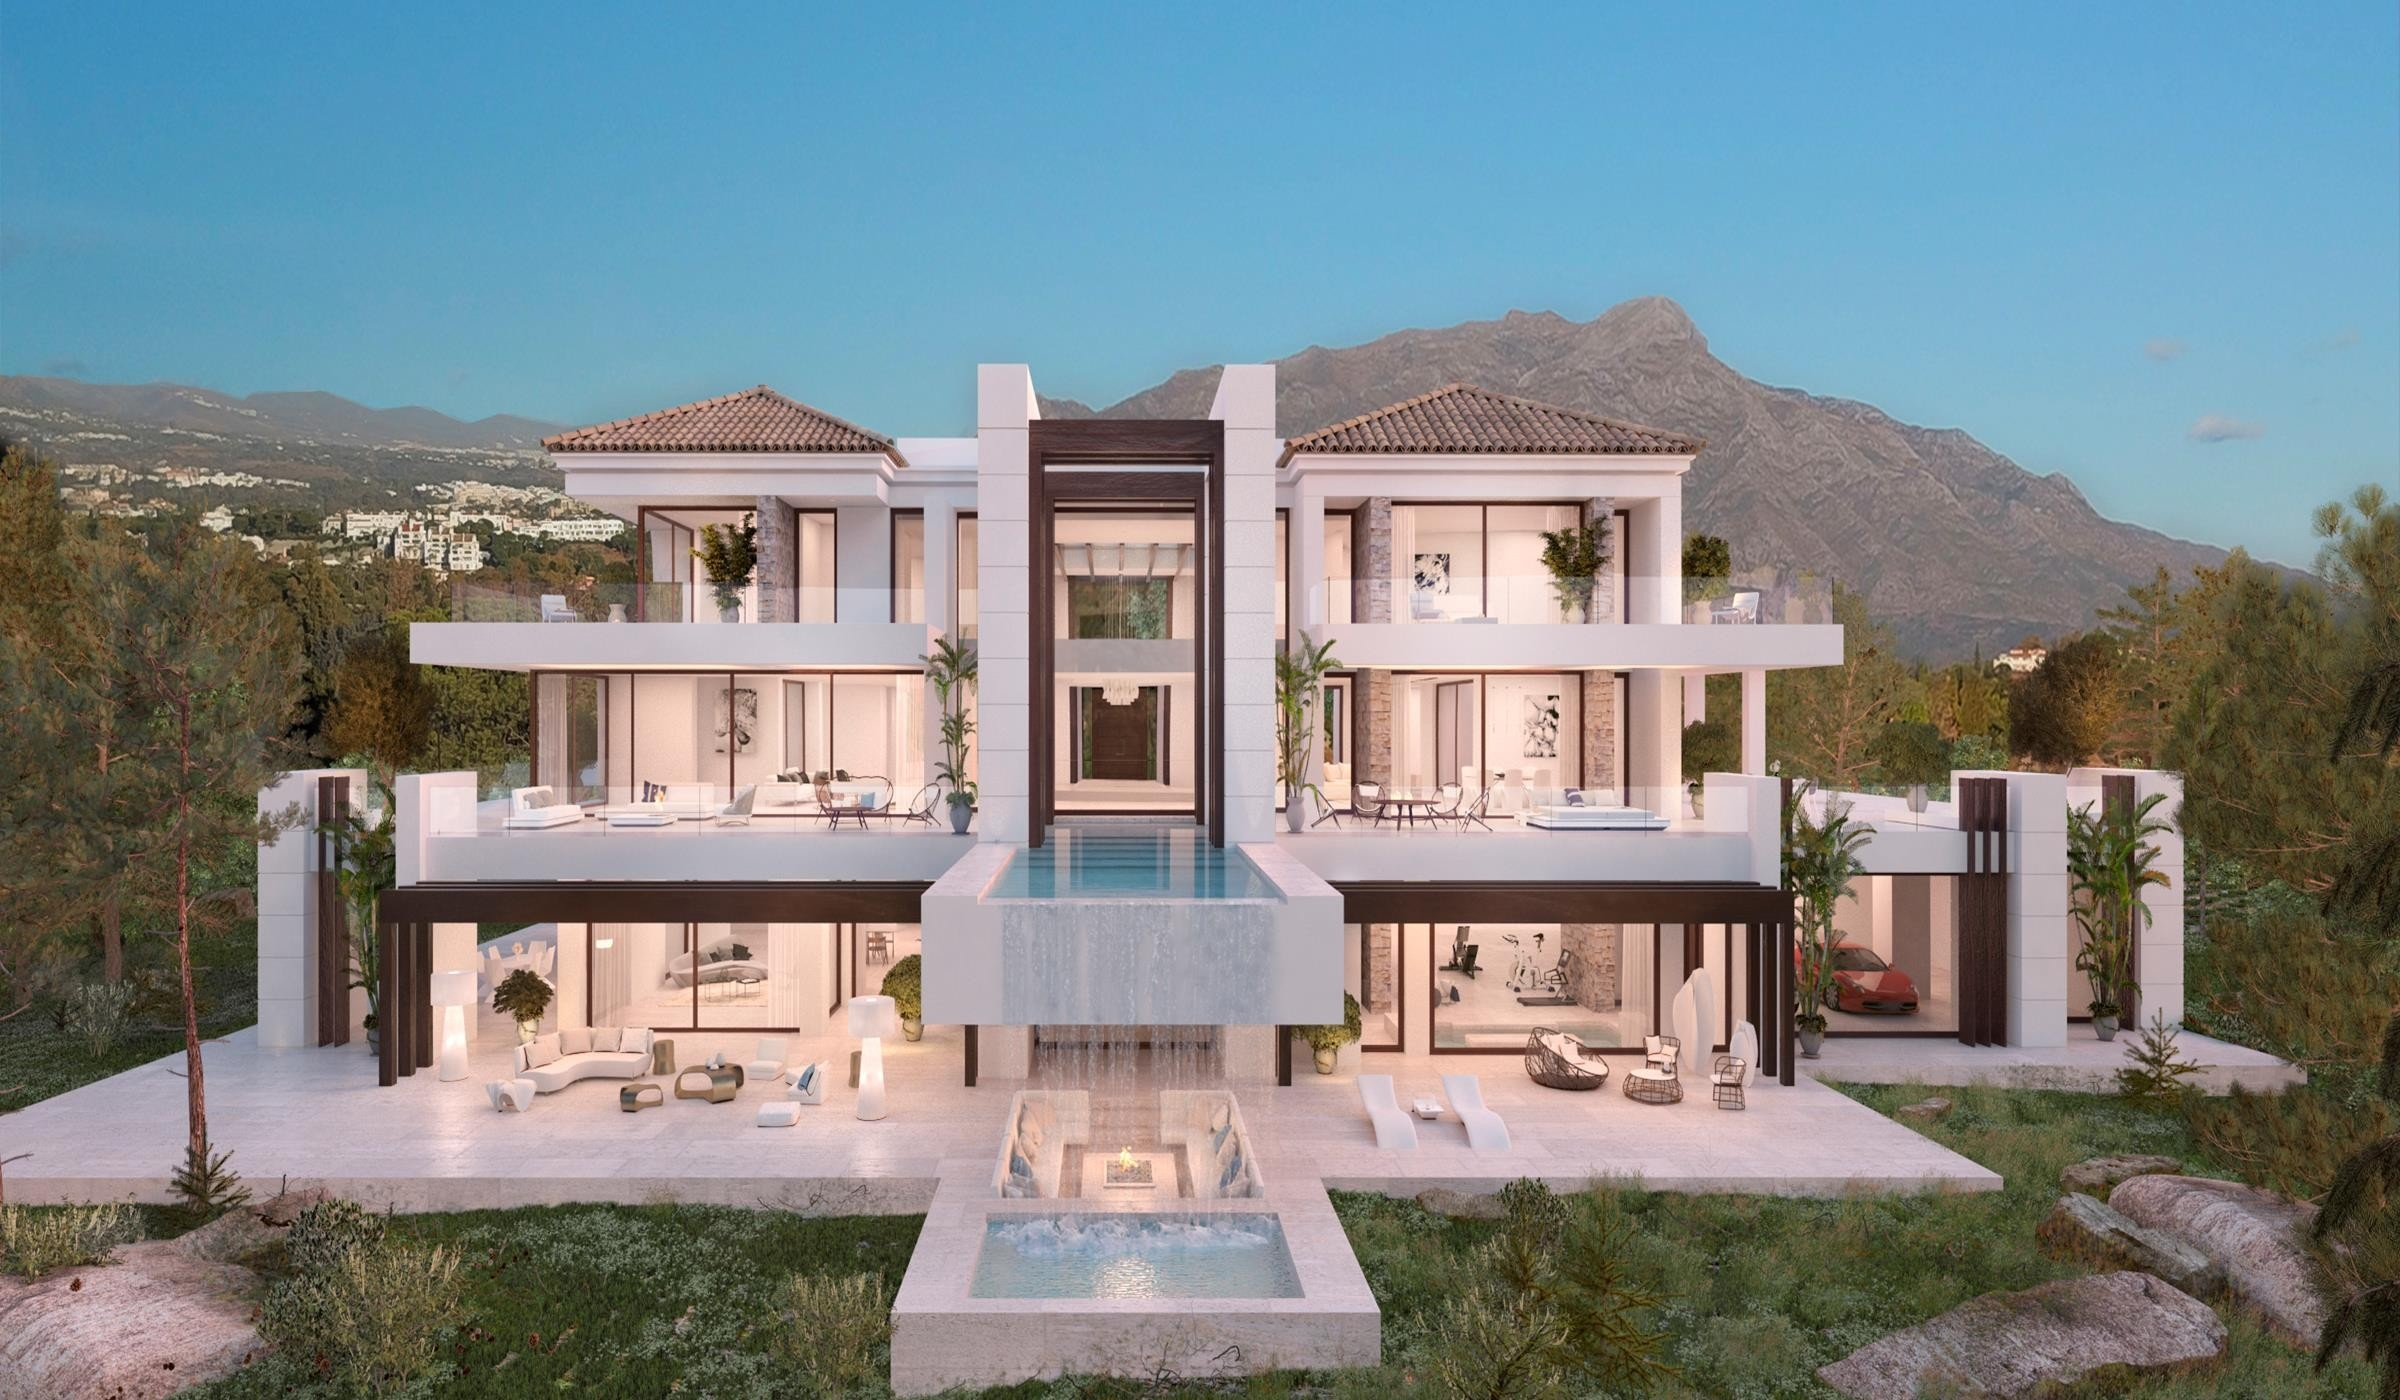 Villa moderna de estilo Andaluz. Benahavis.